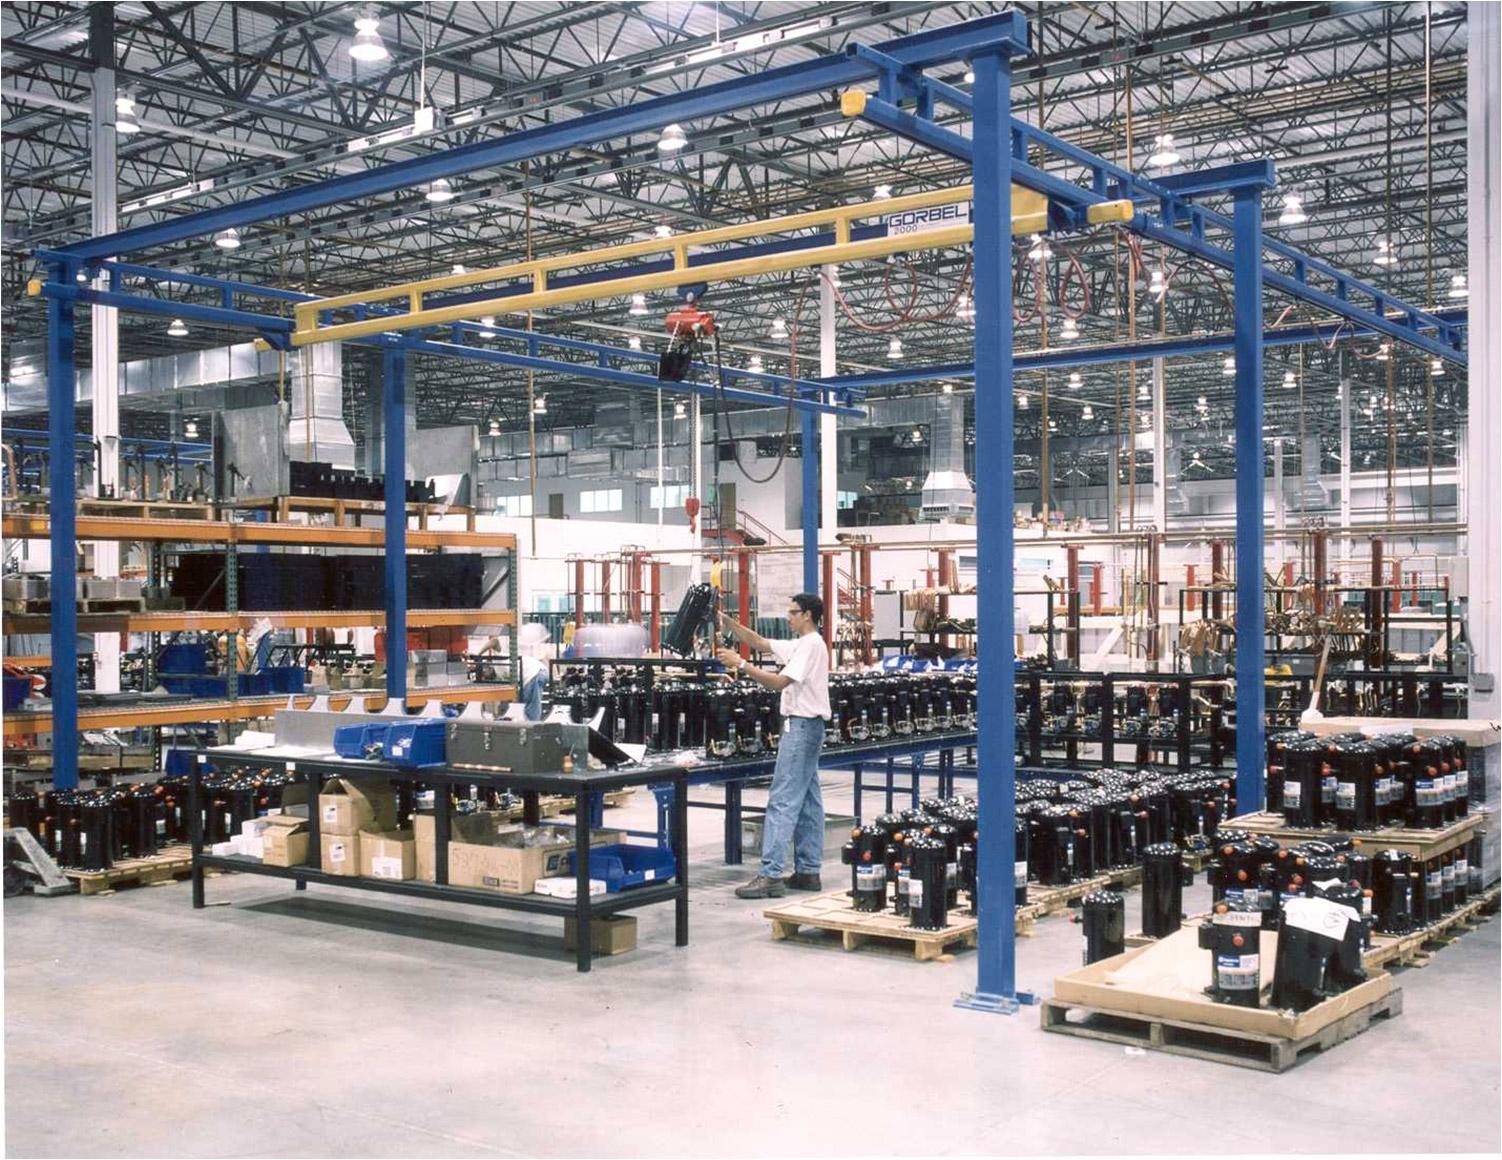 Ergonomic Assist Systems And Equipment Equipment Photos